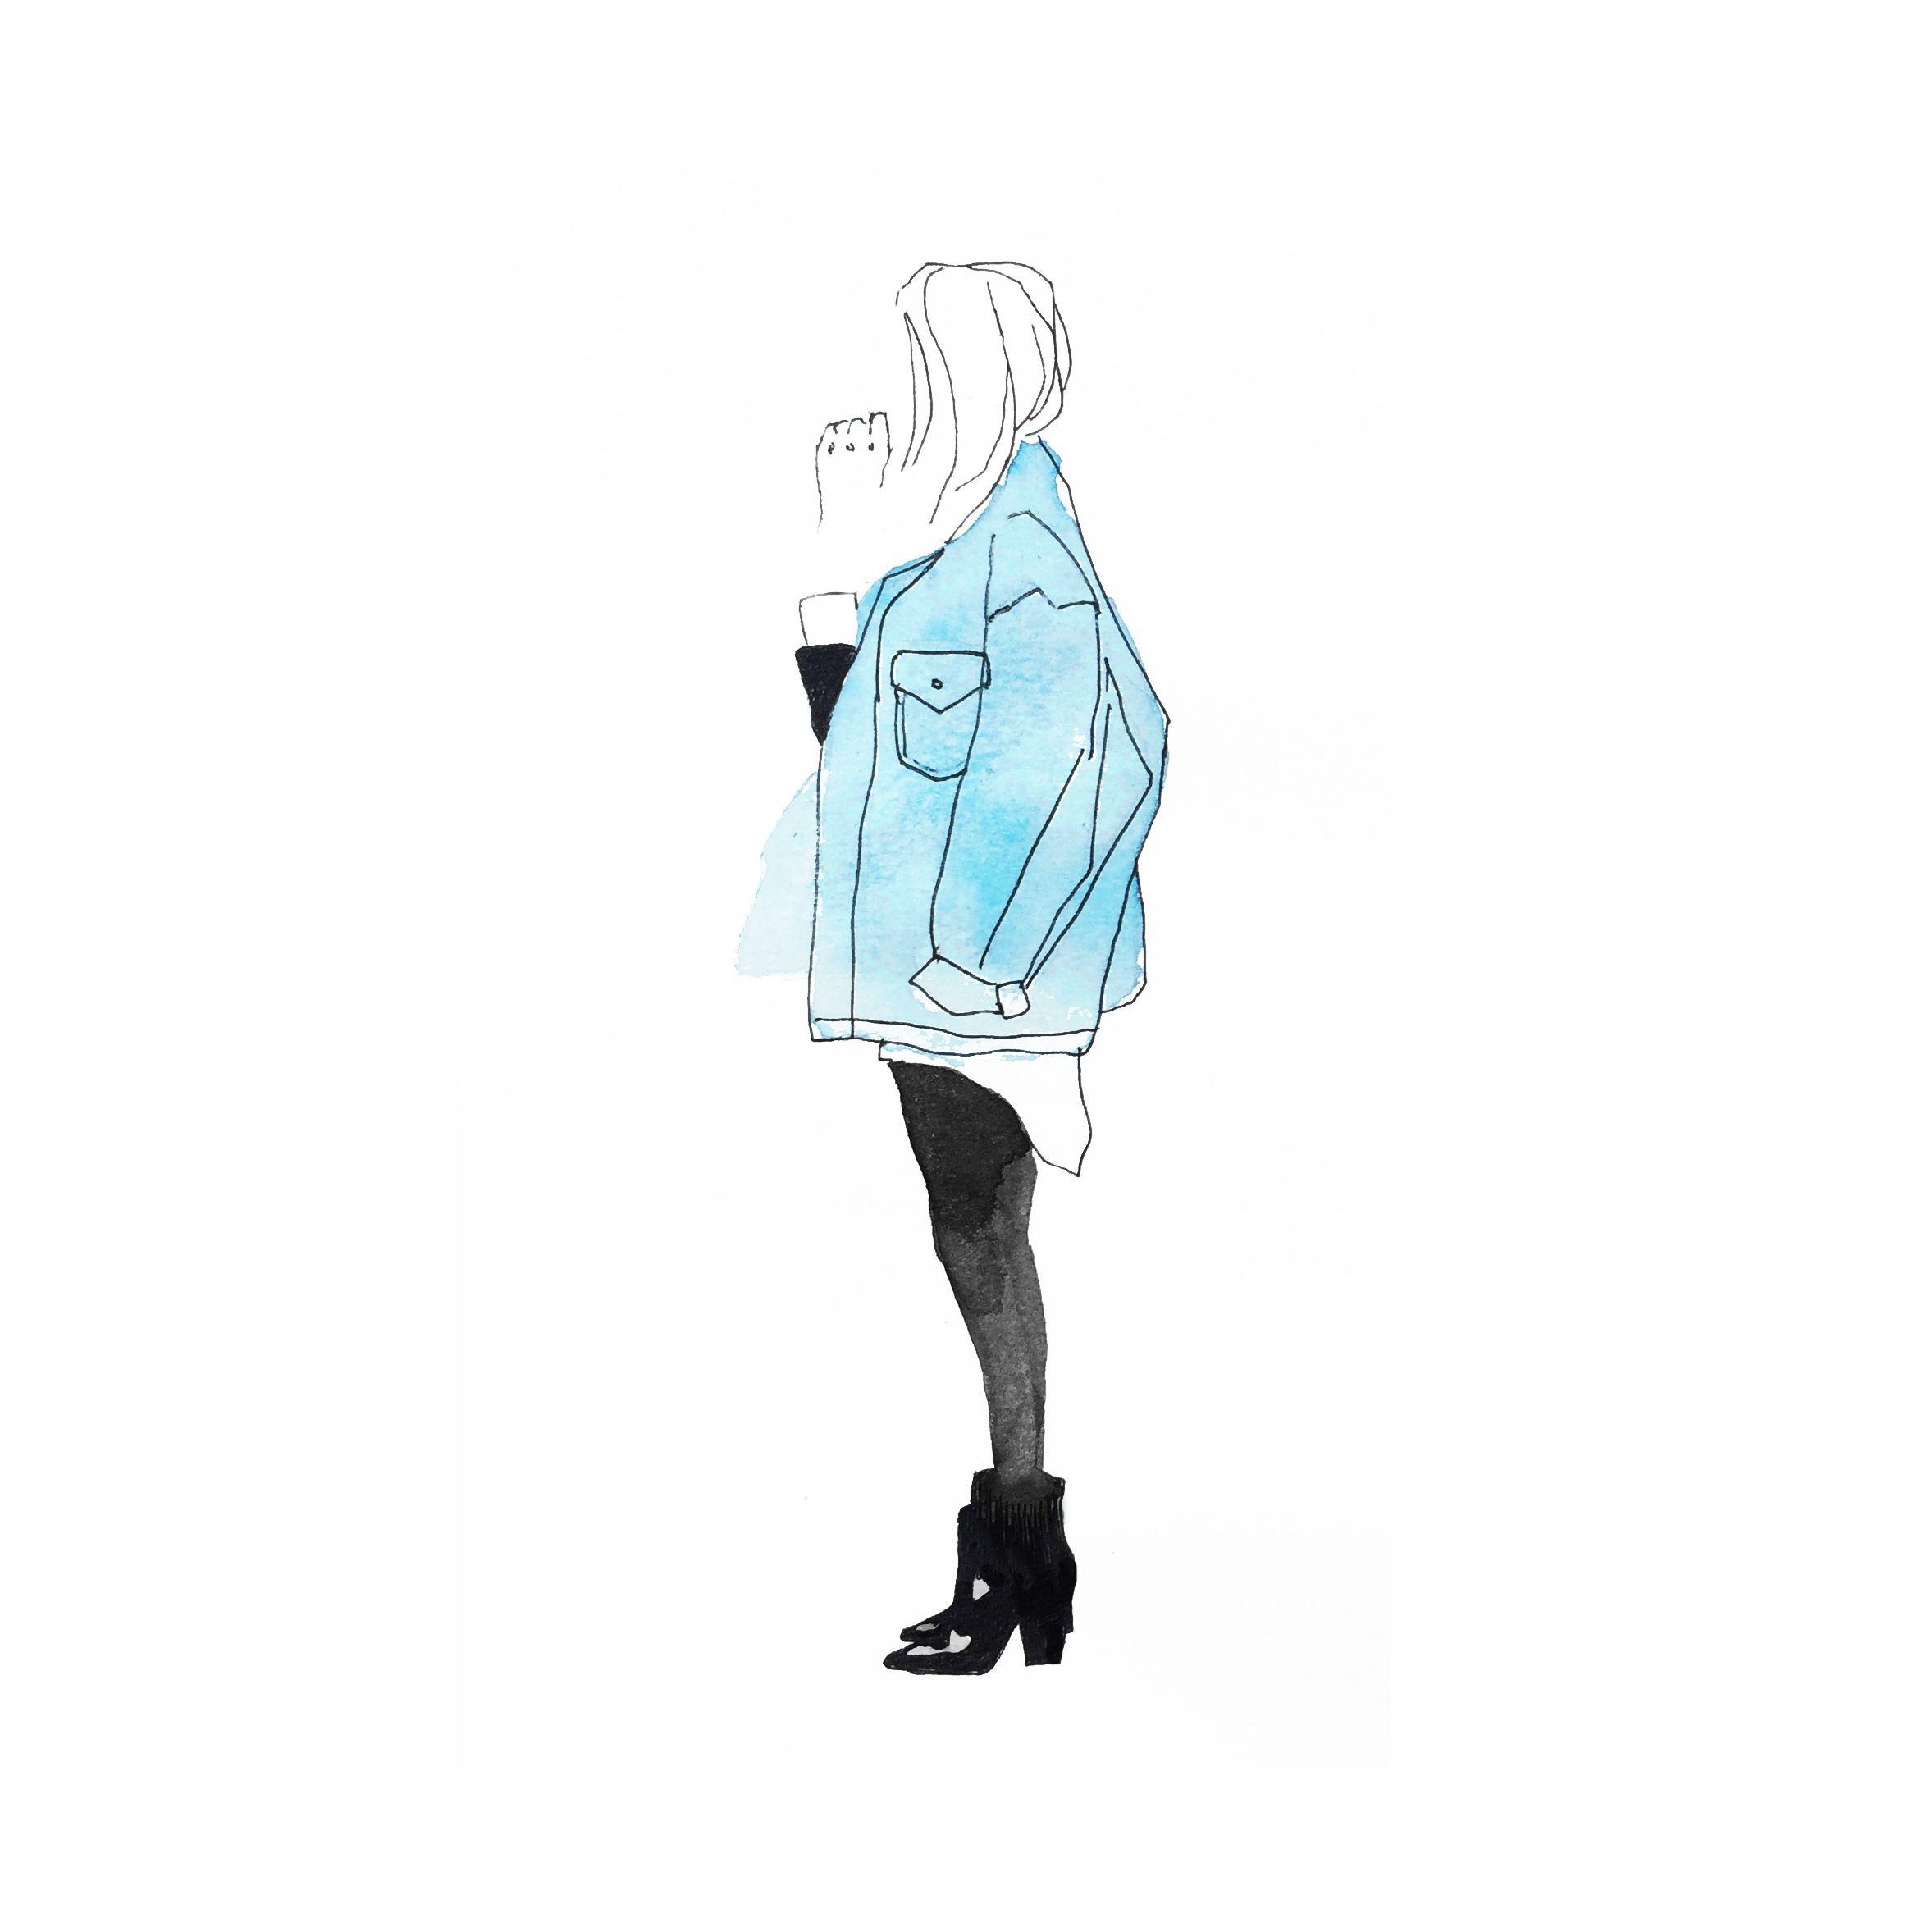 Miscellaneous Fashion Illustrations on Behance